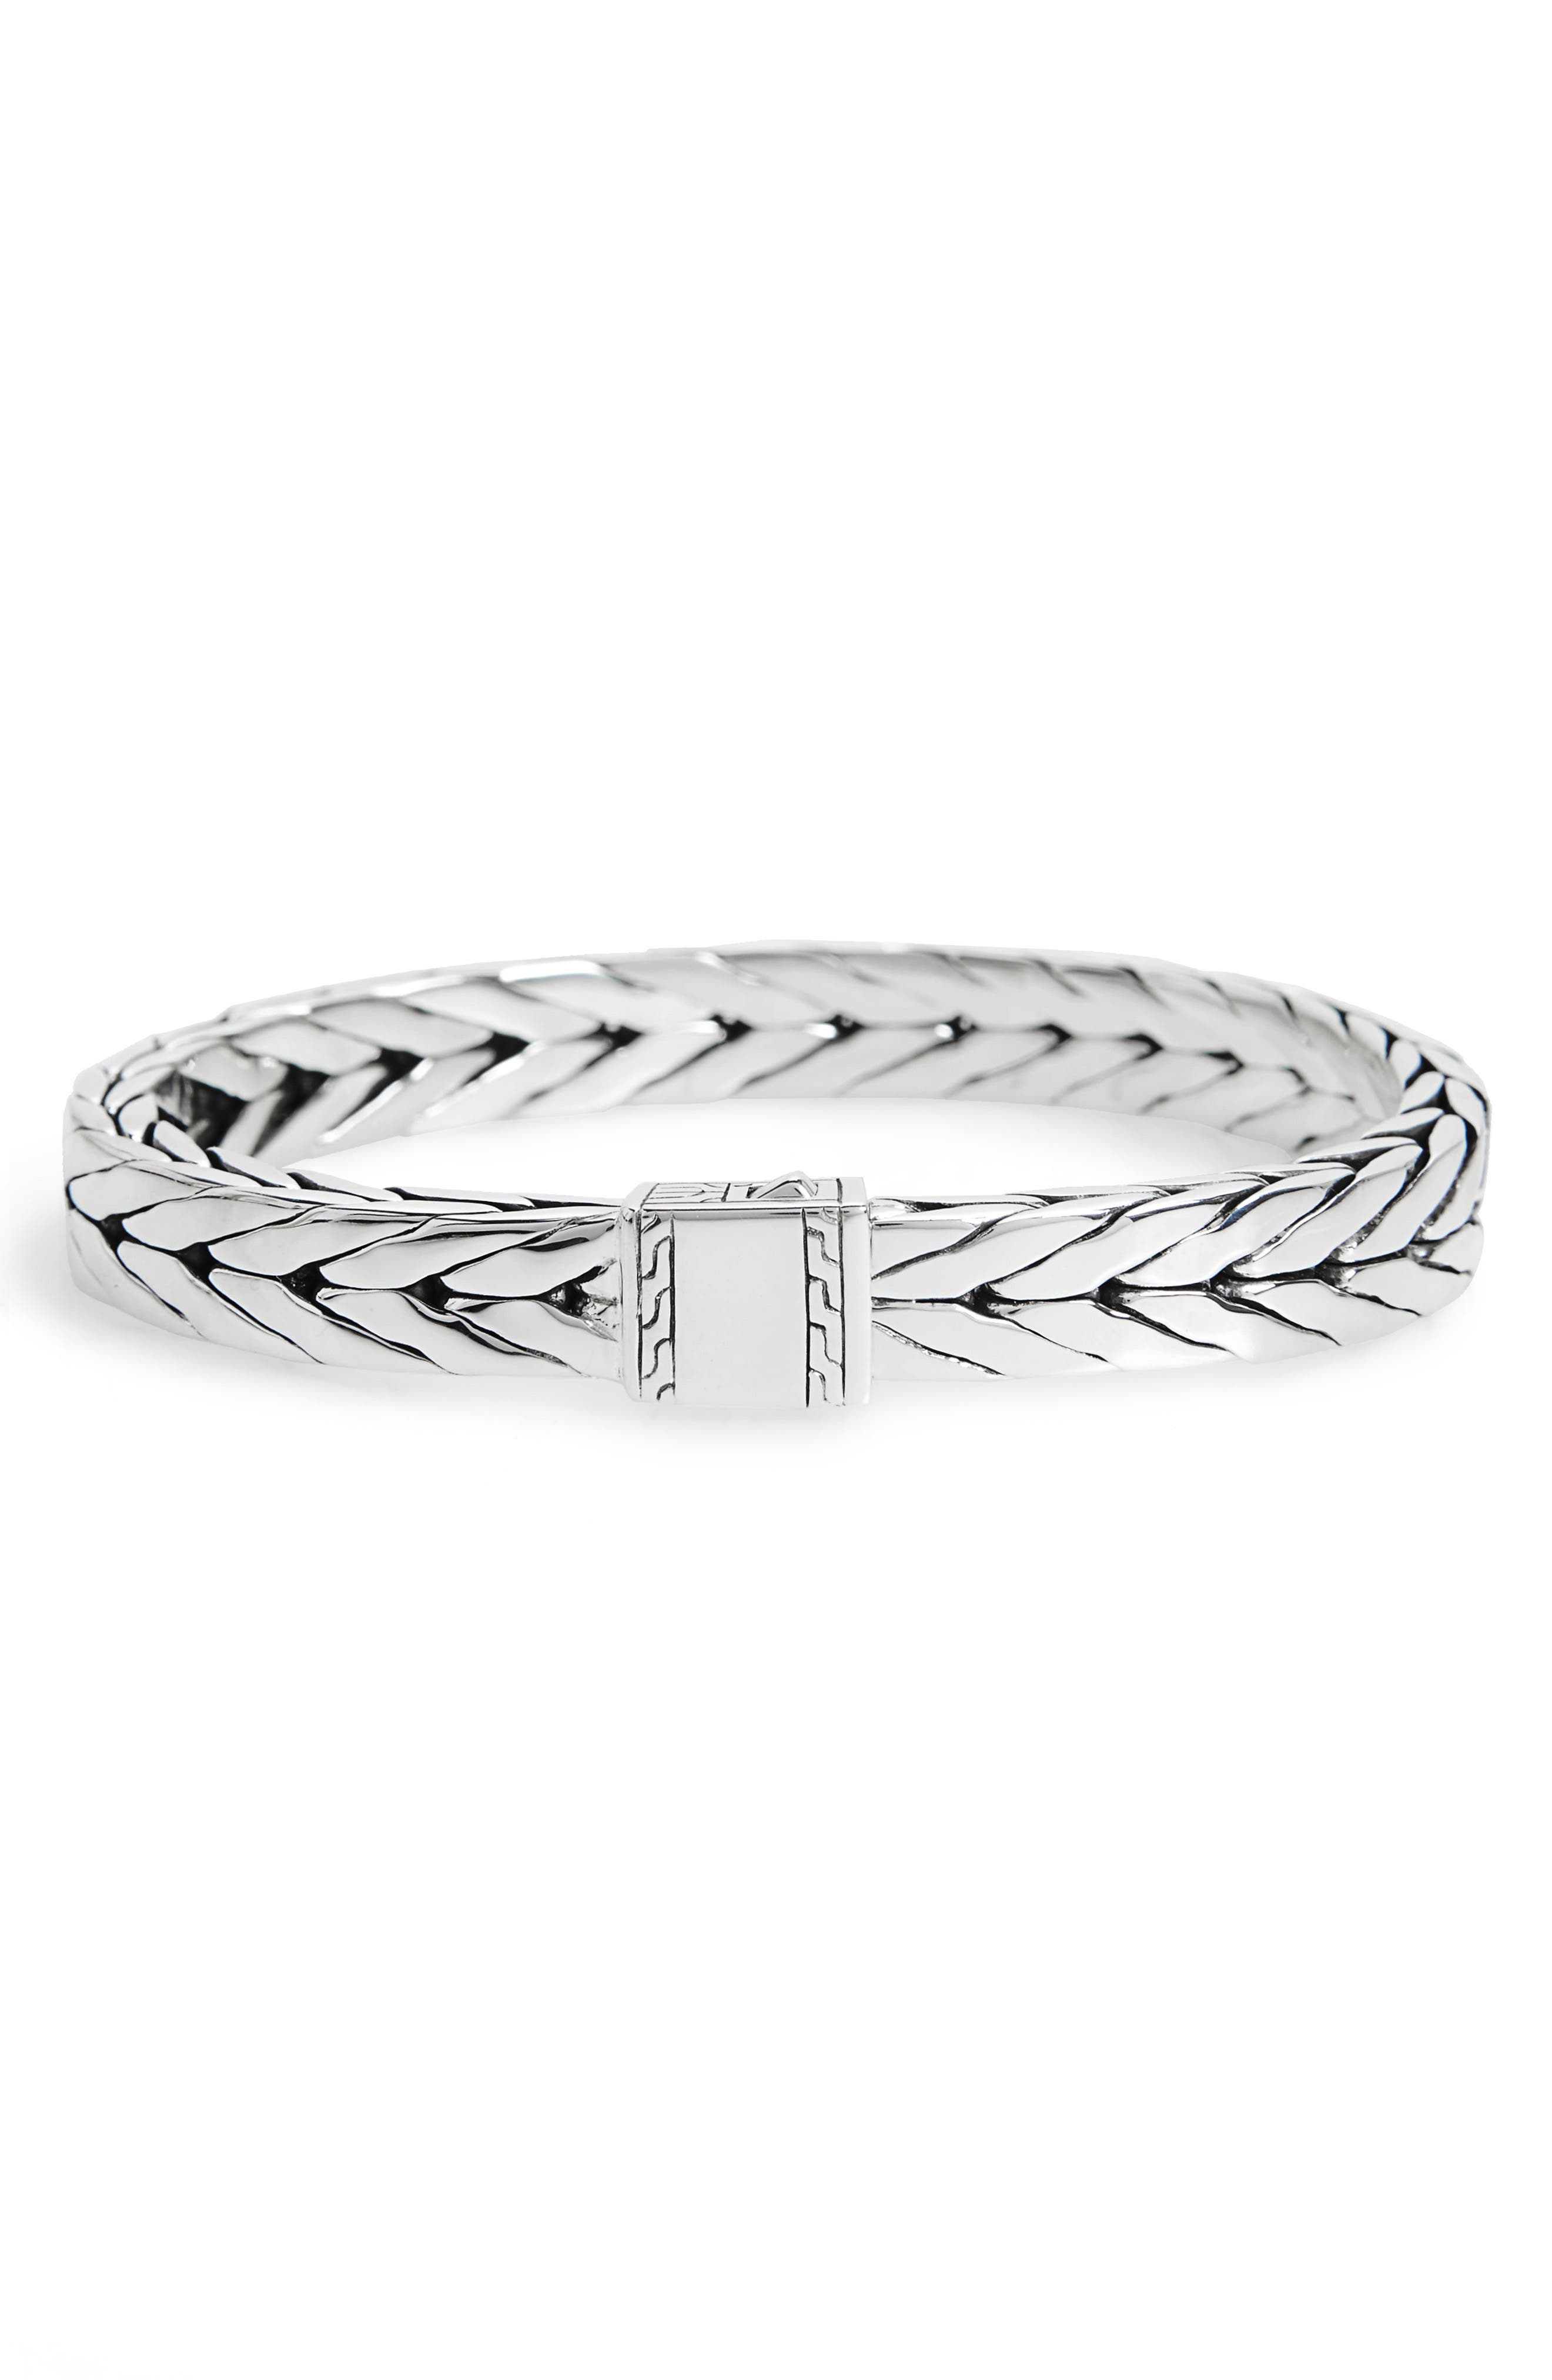 John Hardy Modern Chain 9mm Bracelet